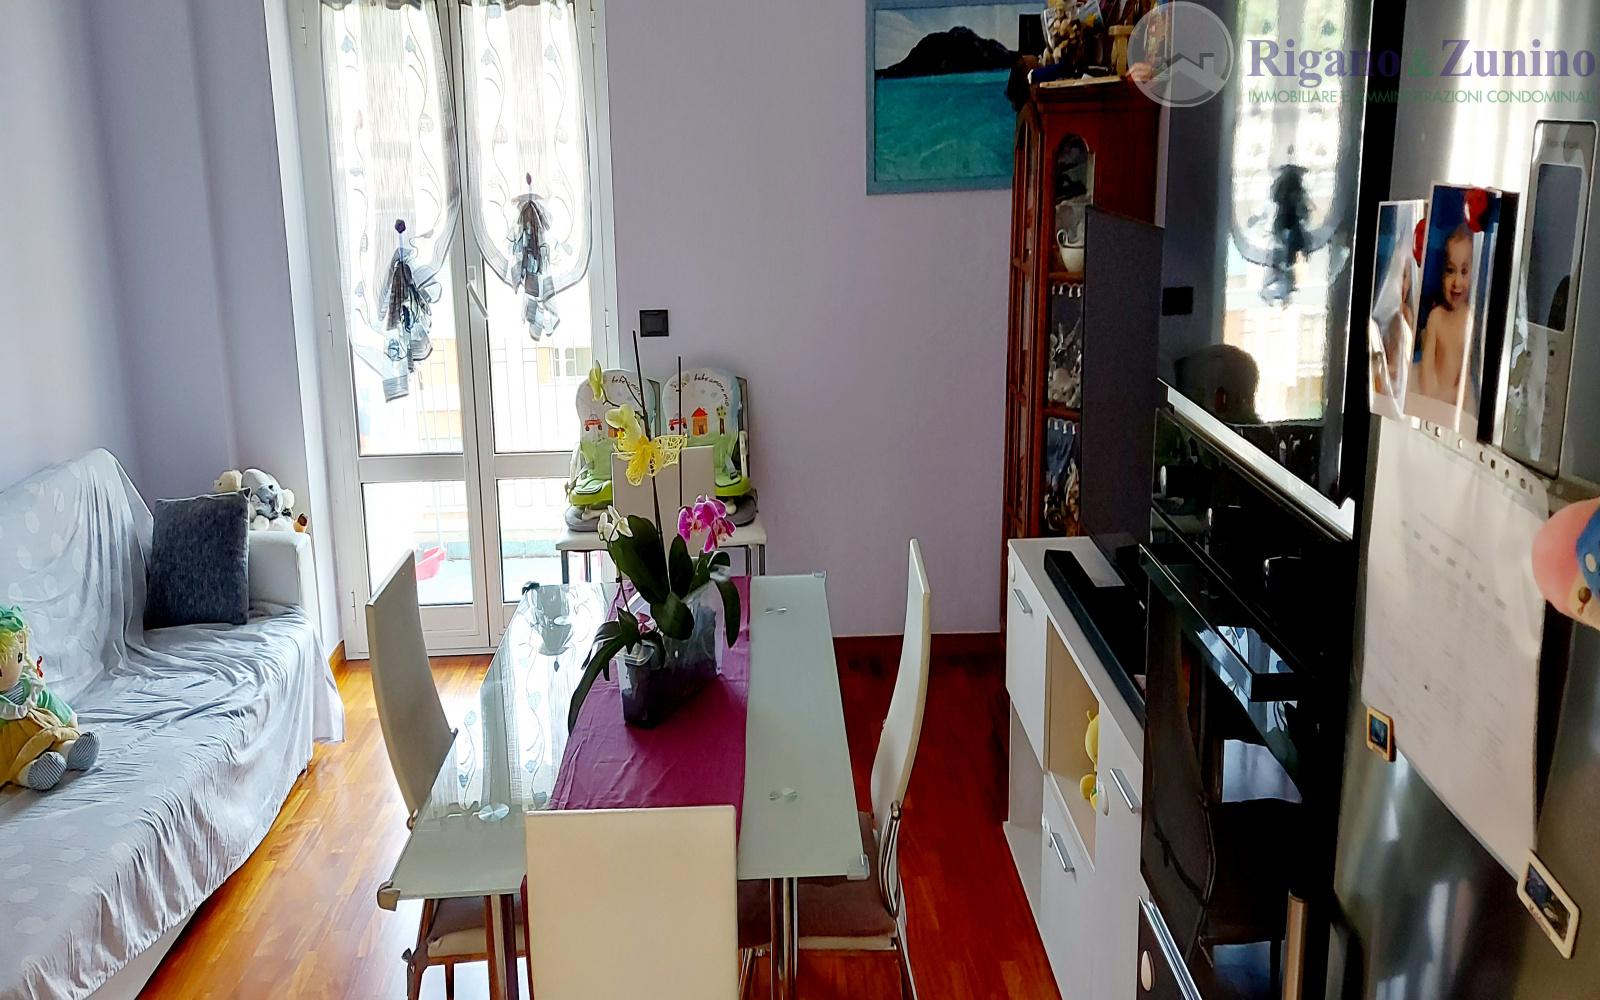 Via Del Capriolo Via Brigata Liguria,Genova,16121,Appartamento,Via Del Capriolo ,1202